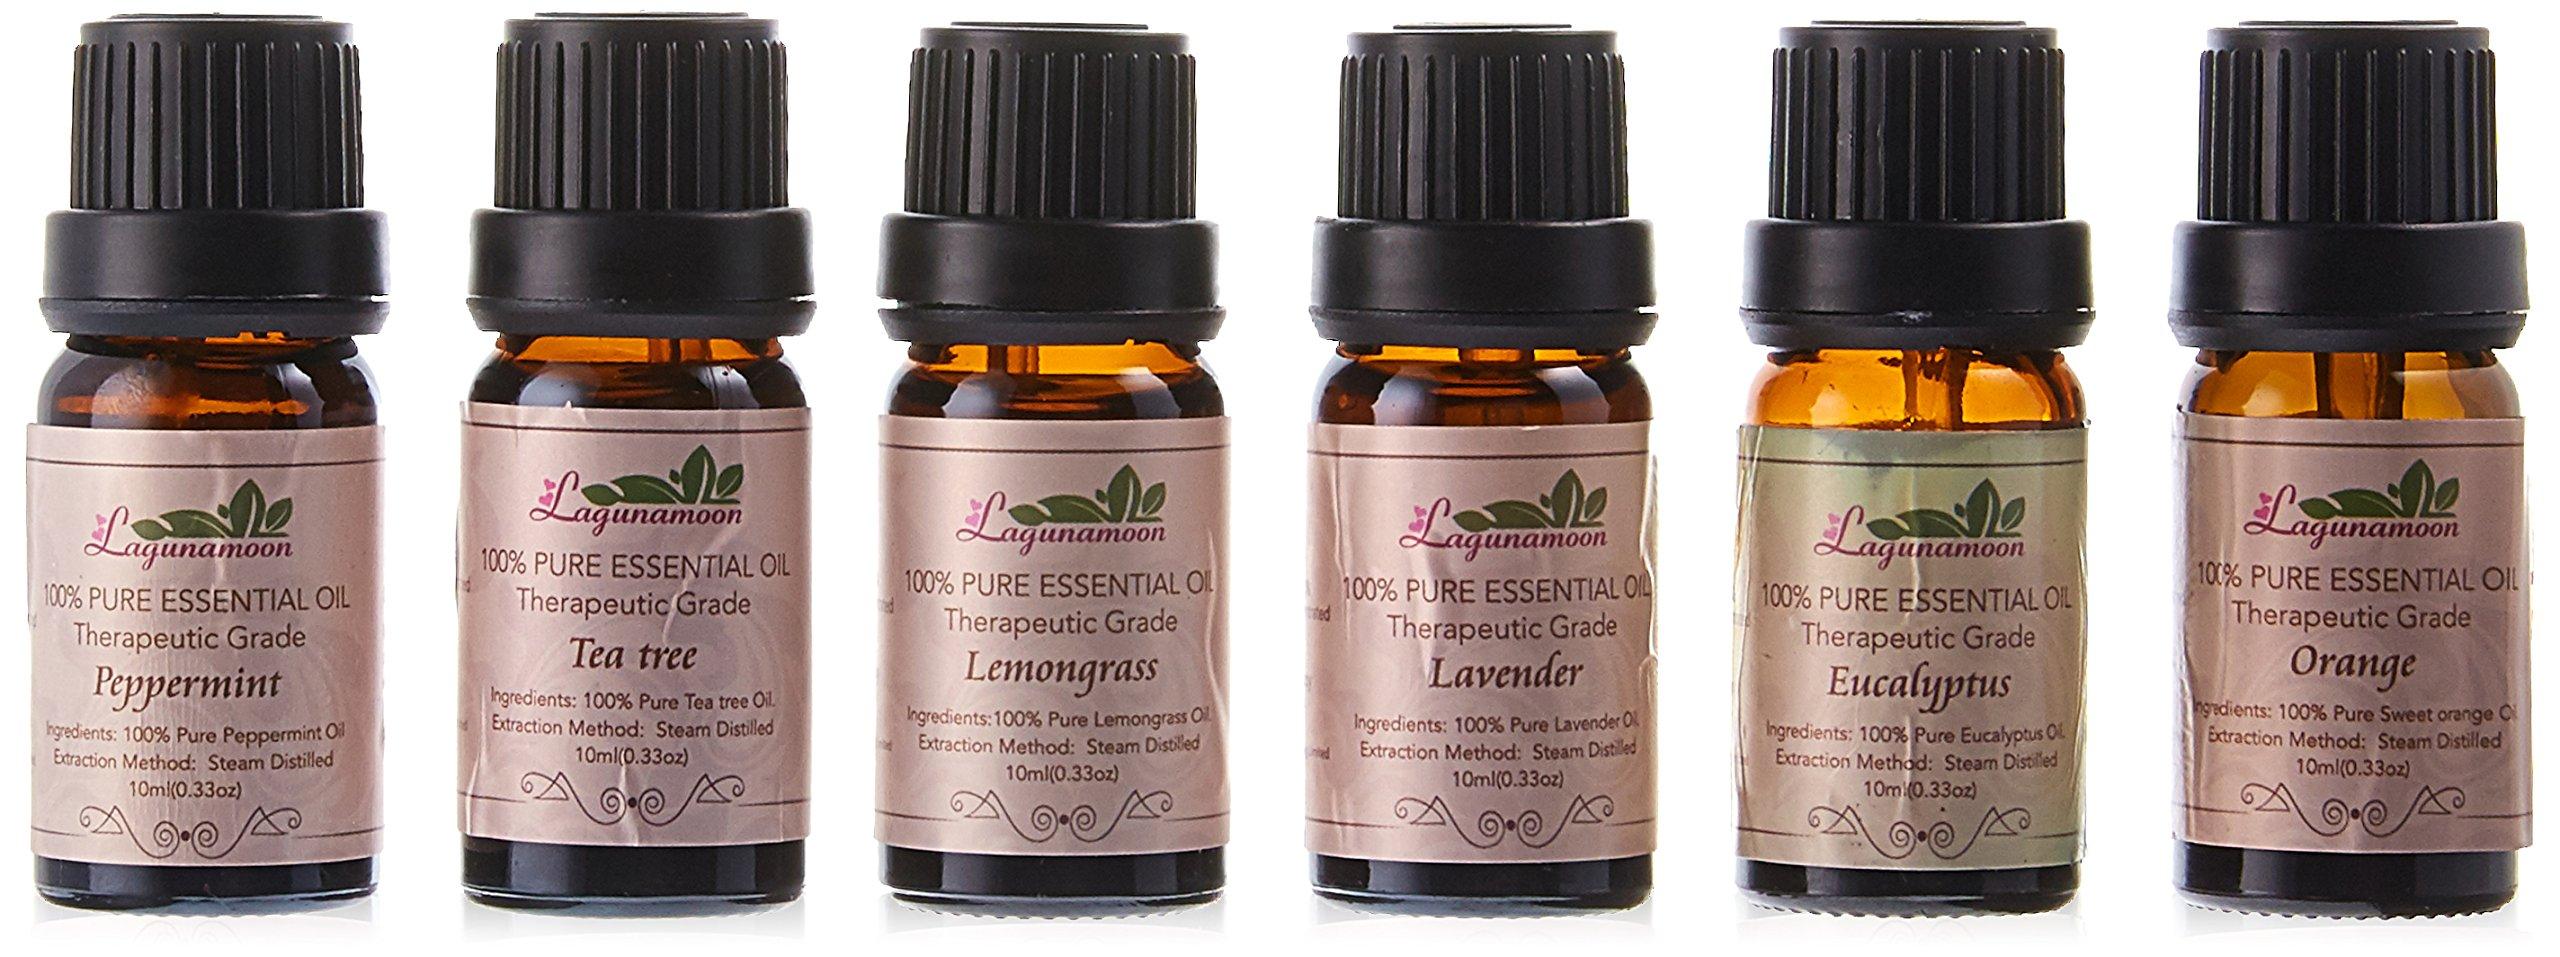 Aromatherapy Essential Oils Gift Set, Top 6 100% Pure Premium Therapeutic Grade Oils -Lavender, Tea Tree , Eucalyptus, Lemongrass, Orange, Peppermint Essential Oils